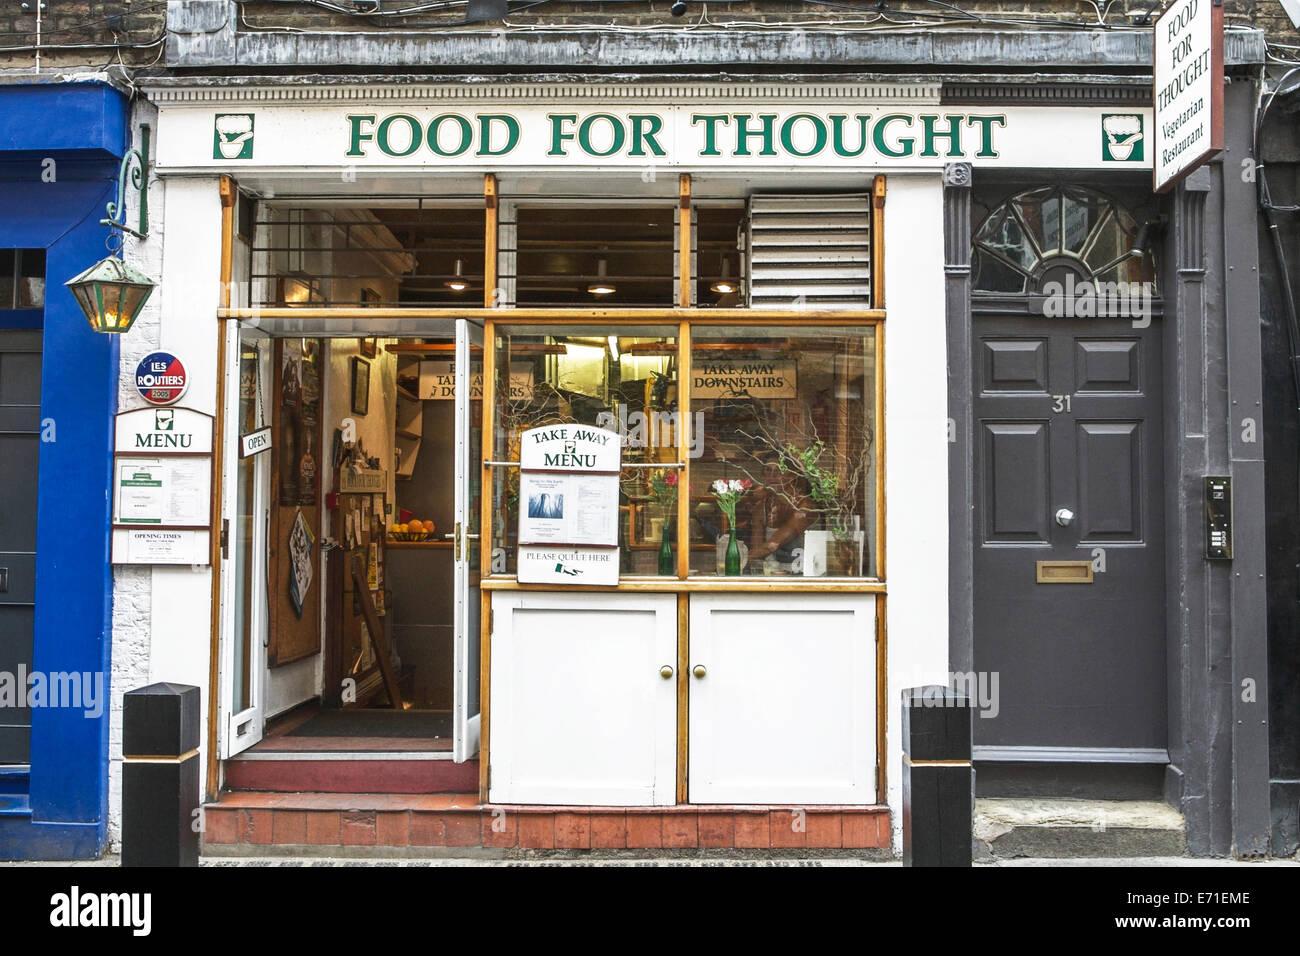 London Vegetarian Restaurant Stock Photos & London Vegetarian ...